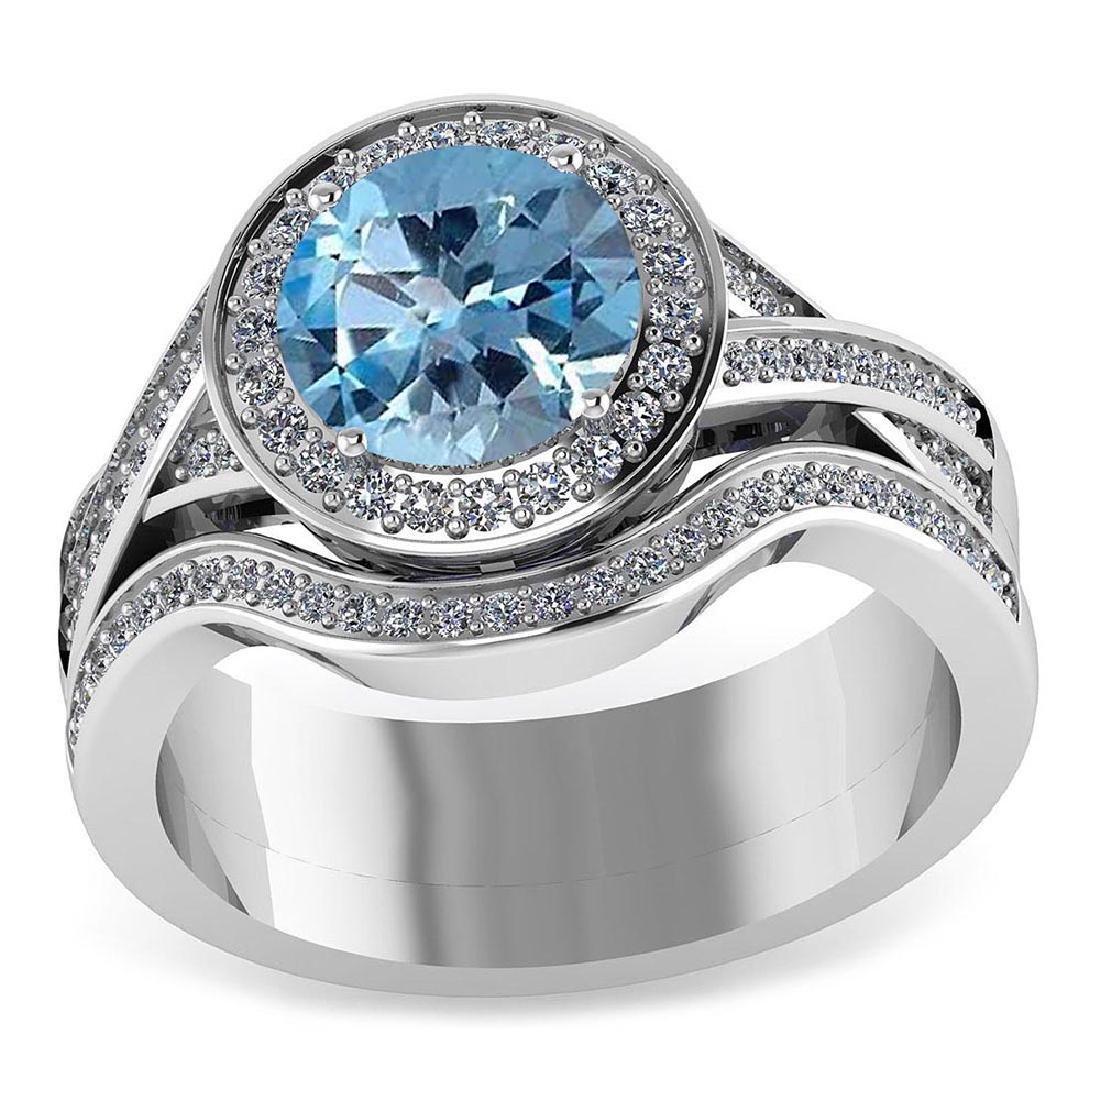 Certified 2.15 CTW Genuine Aquamarine And Diamond 14K W